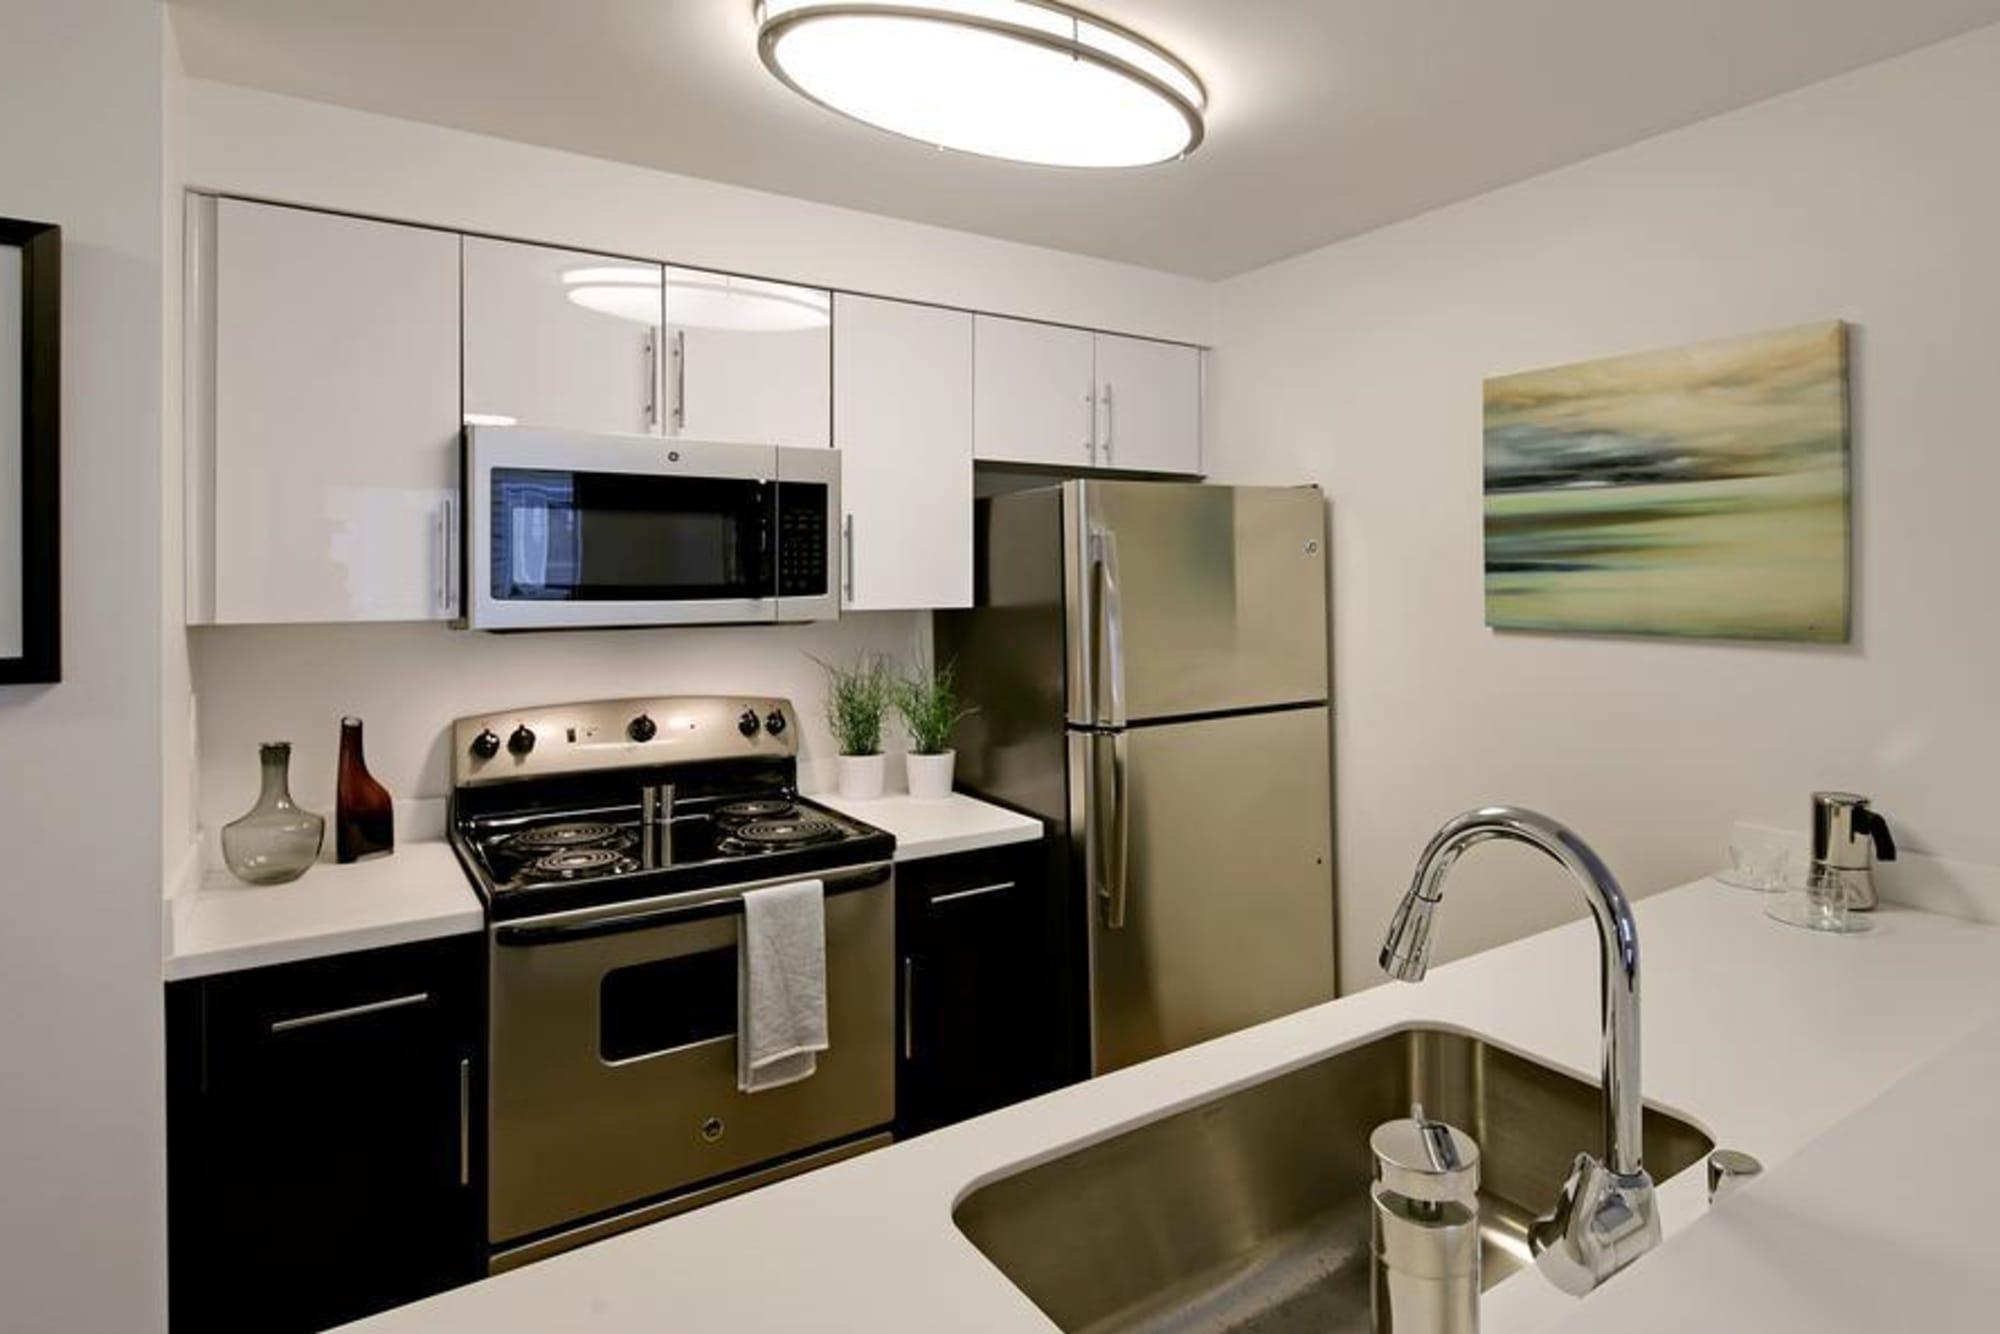 Narrow Kitchen Design at Elan 41 Apartments in Seattle, WA